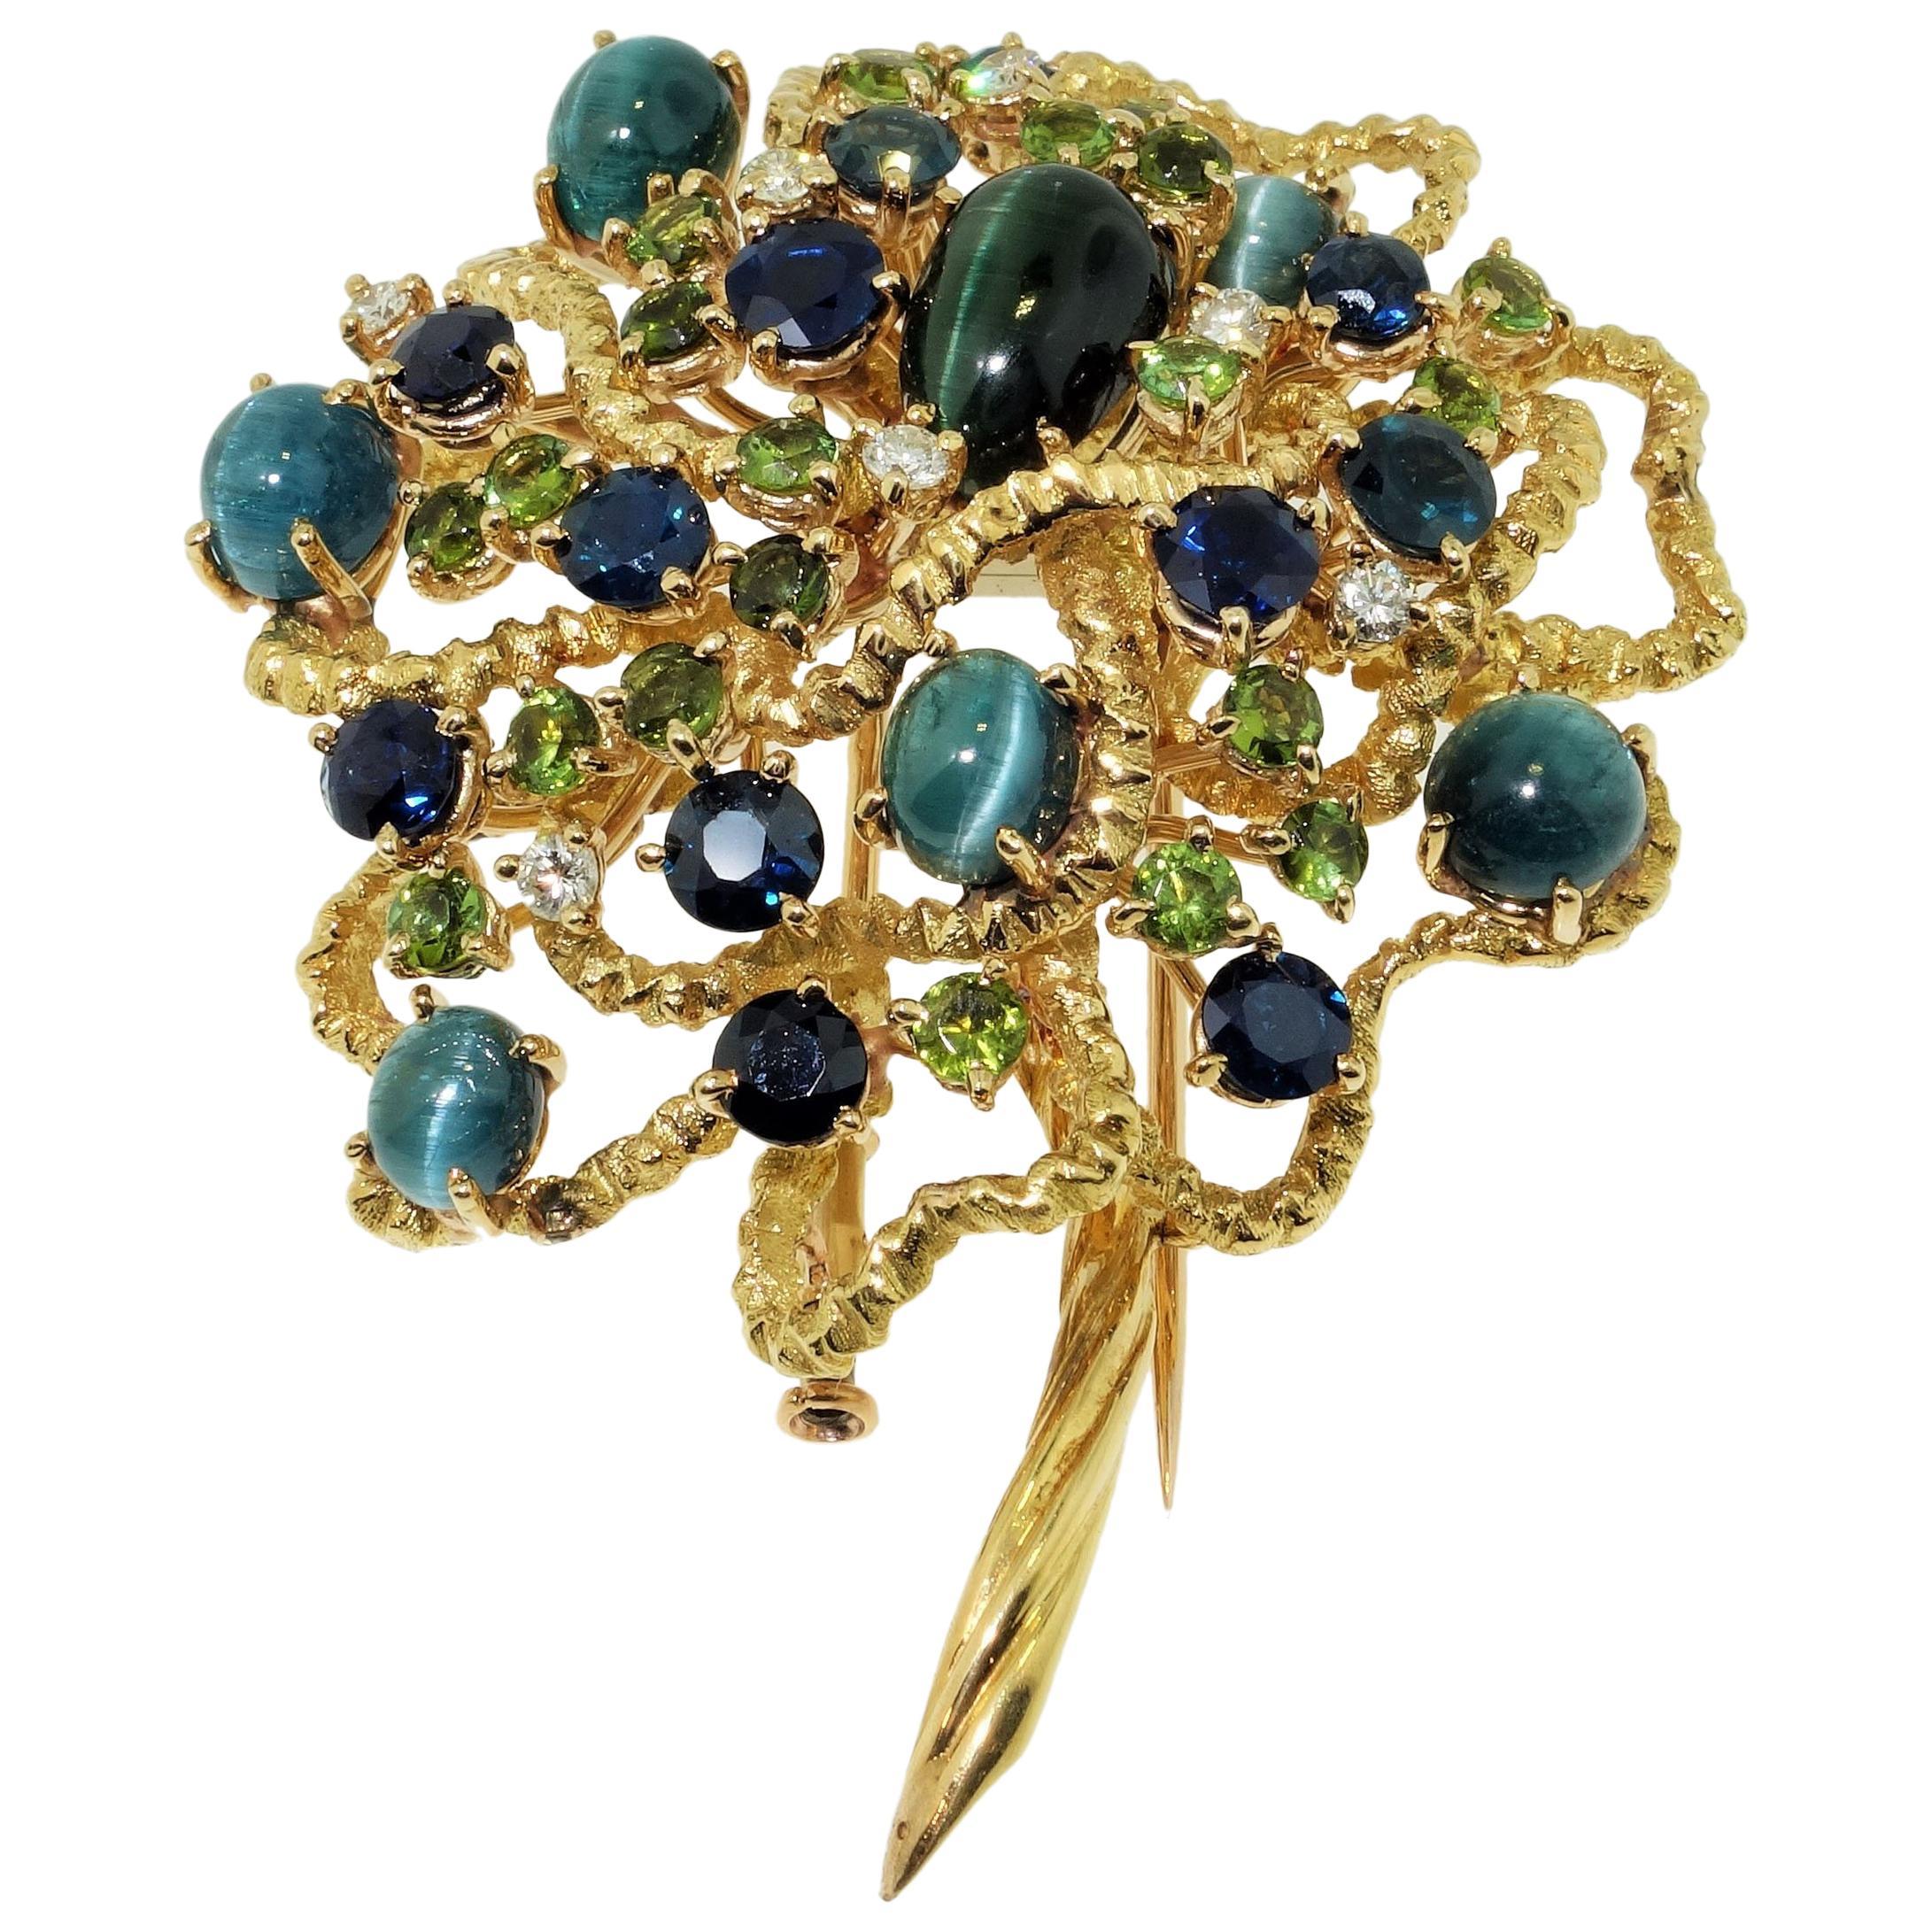 Antique Tourmaline Sapphire and Diamond 18K Gold Brooch Pin Estate Fine Jewelry